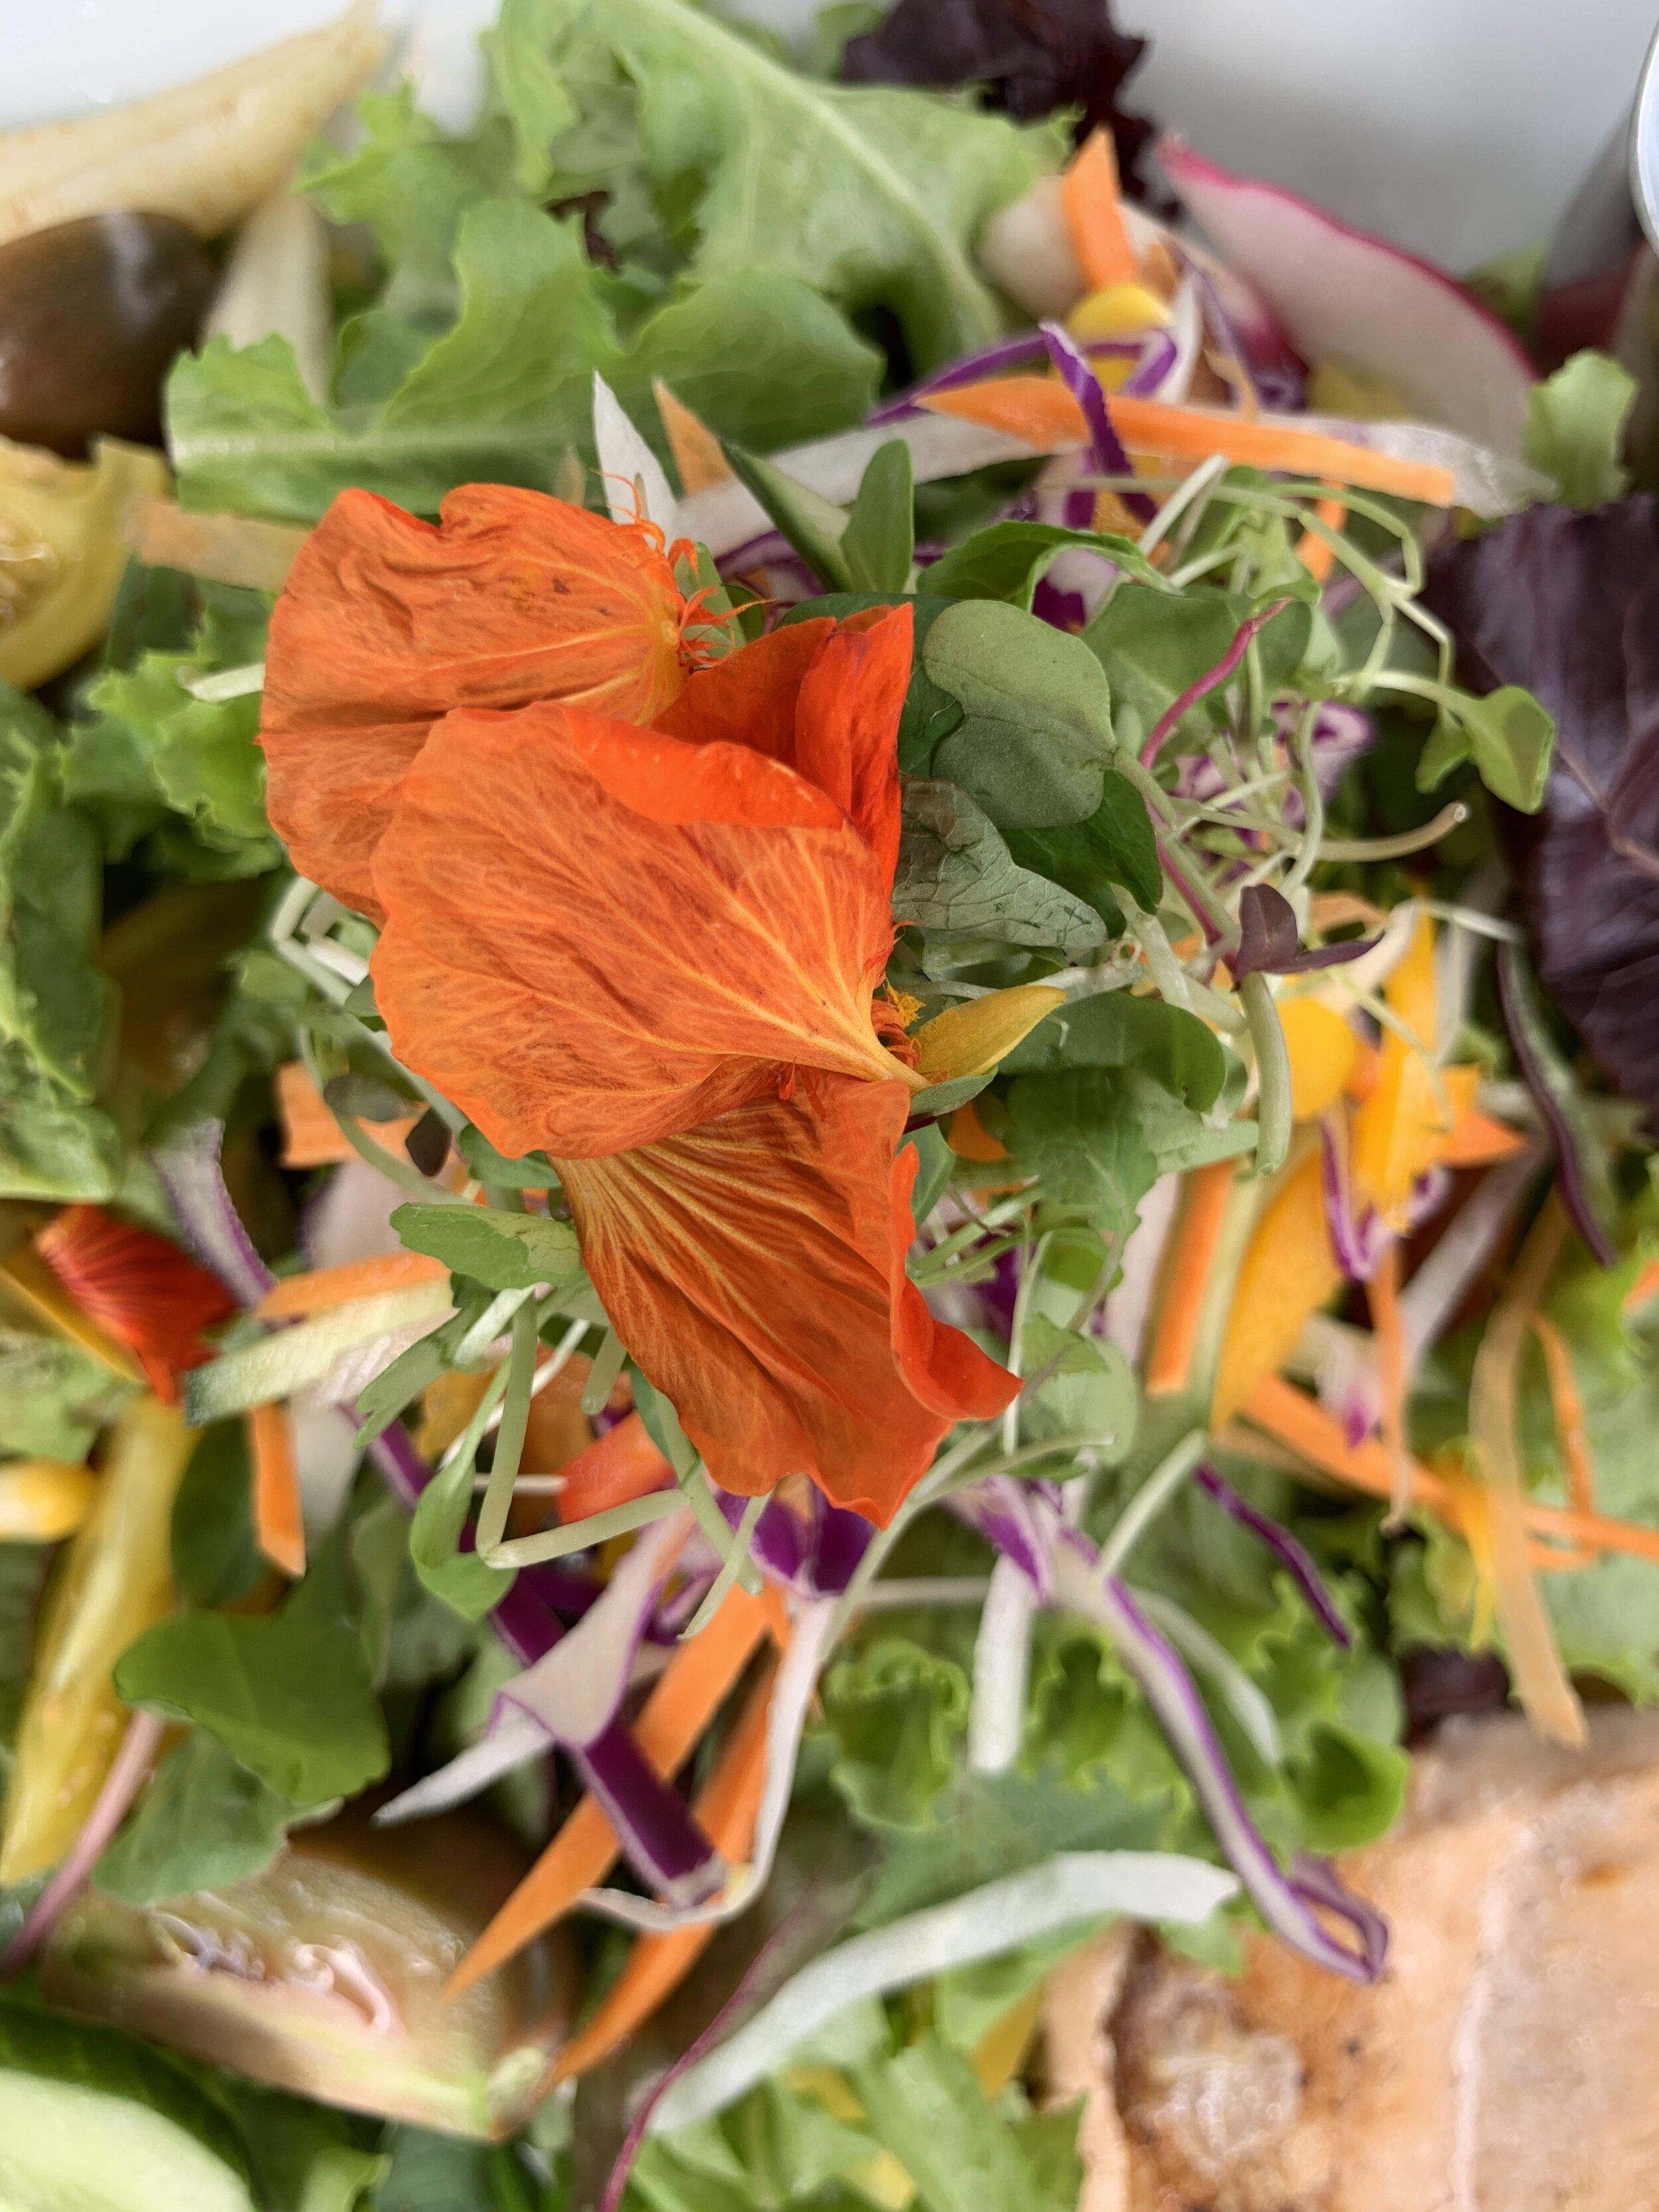 Salad from  Coaba Farms